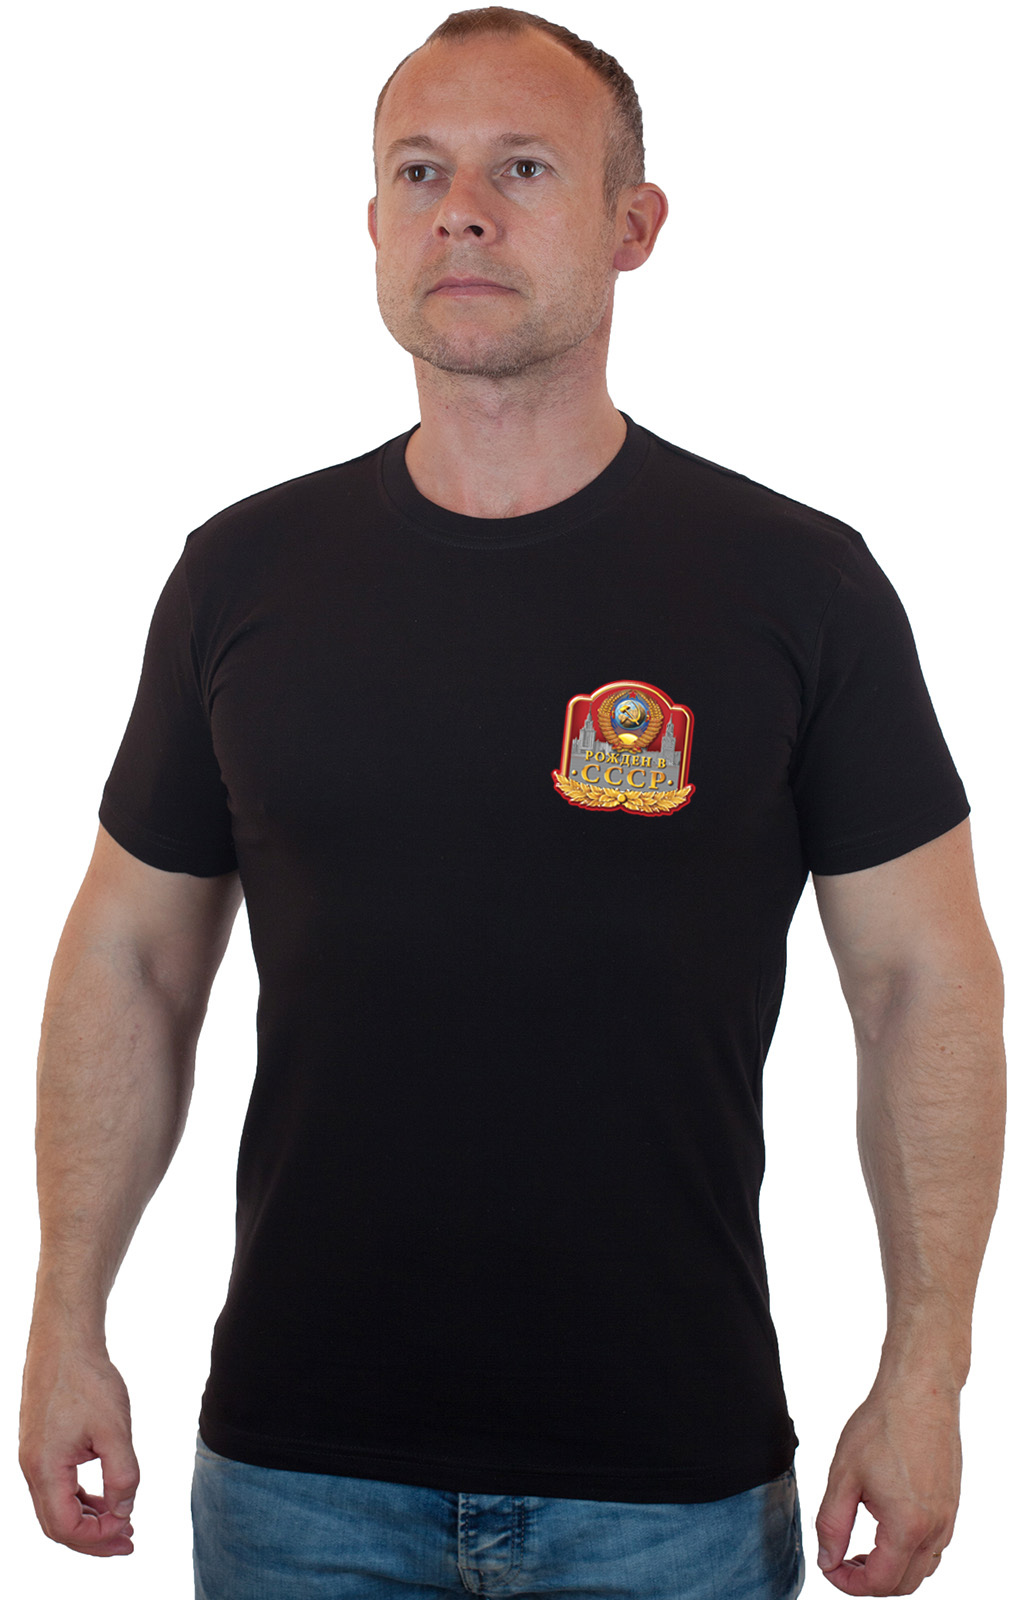 Мужские футболки недорого онлайн